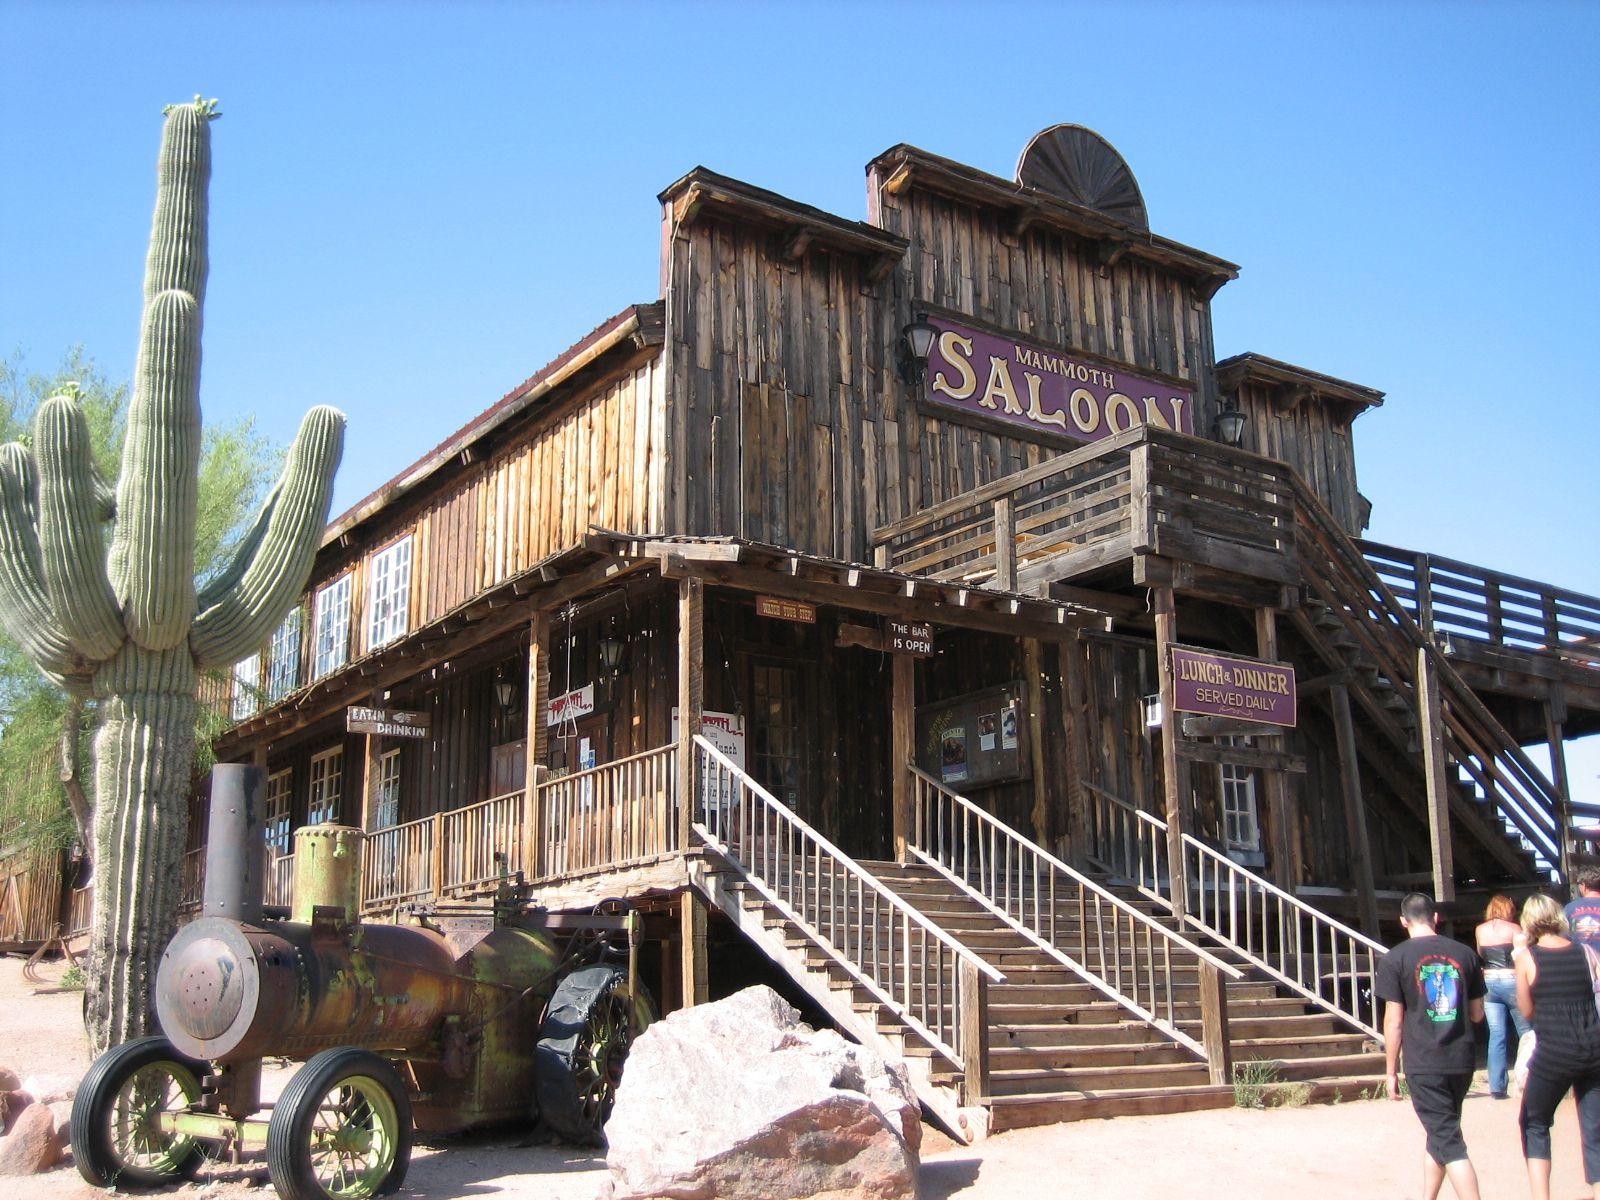 Apache Junction Az For More Please Visit Me At Www